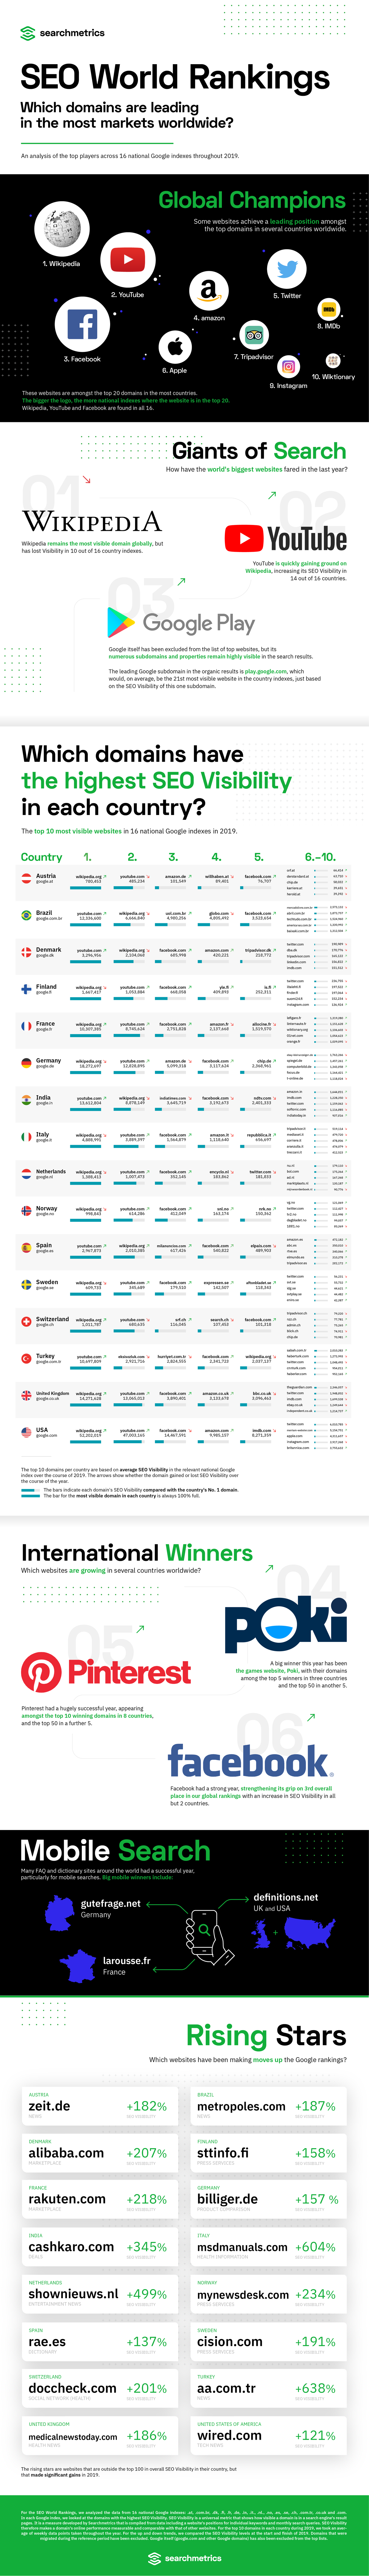 SEO世界ランキング2020